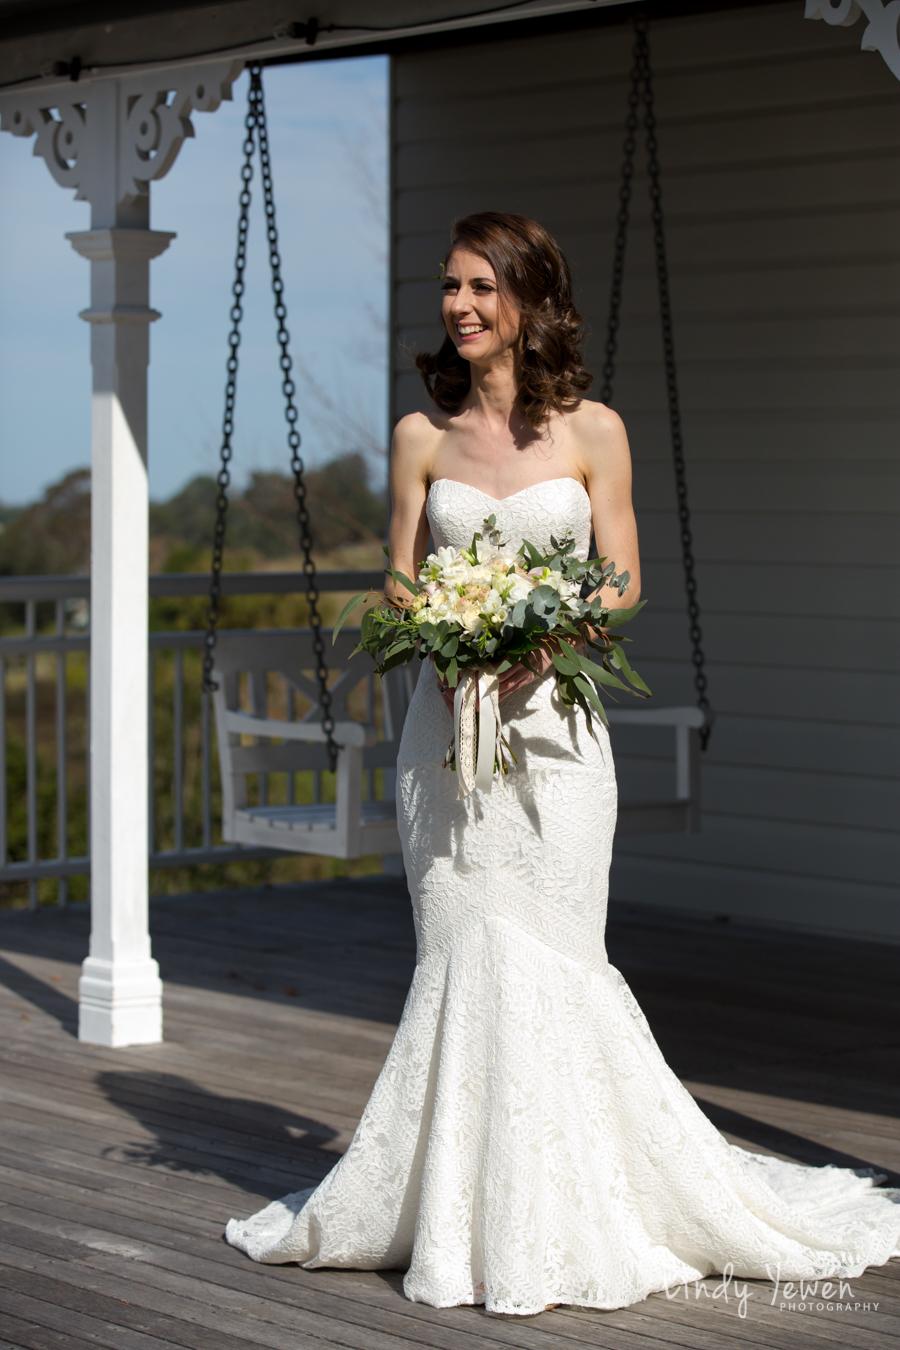 Montville-wedding-photographer-Lauren-Kirby 51.jpg